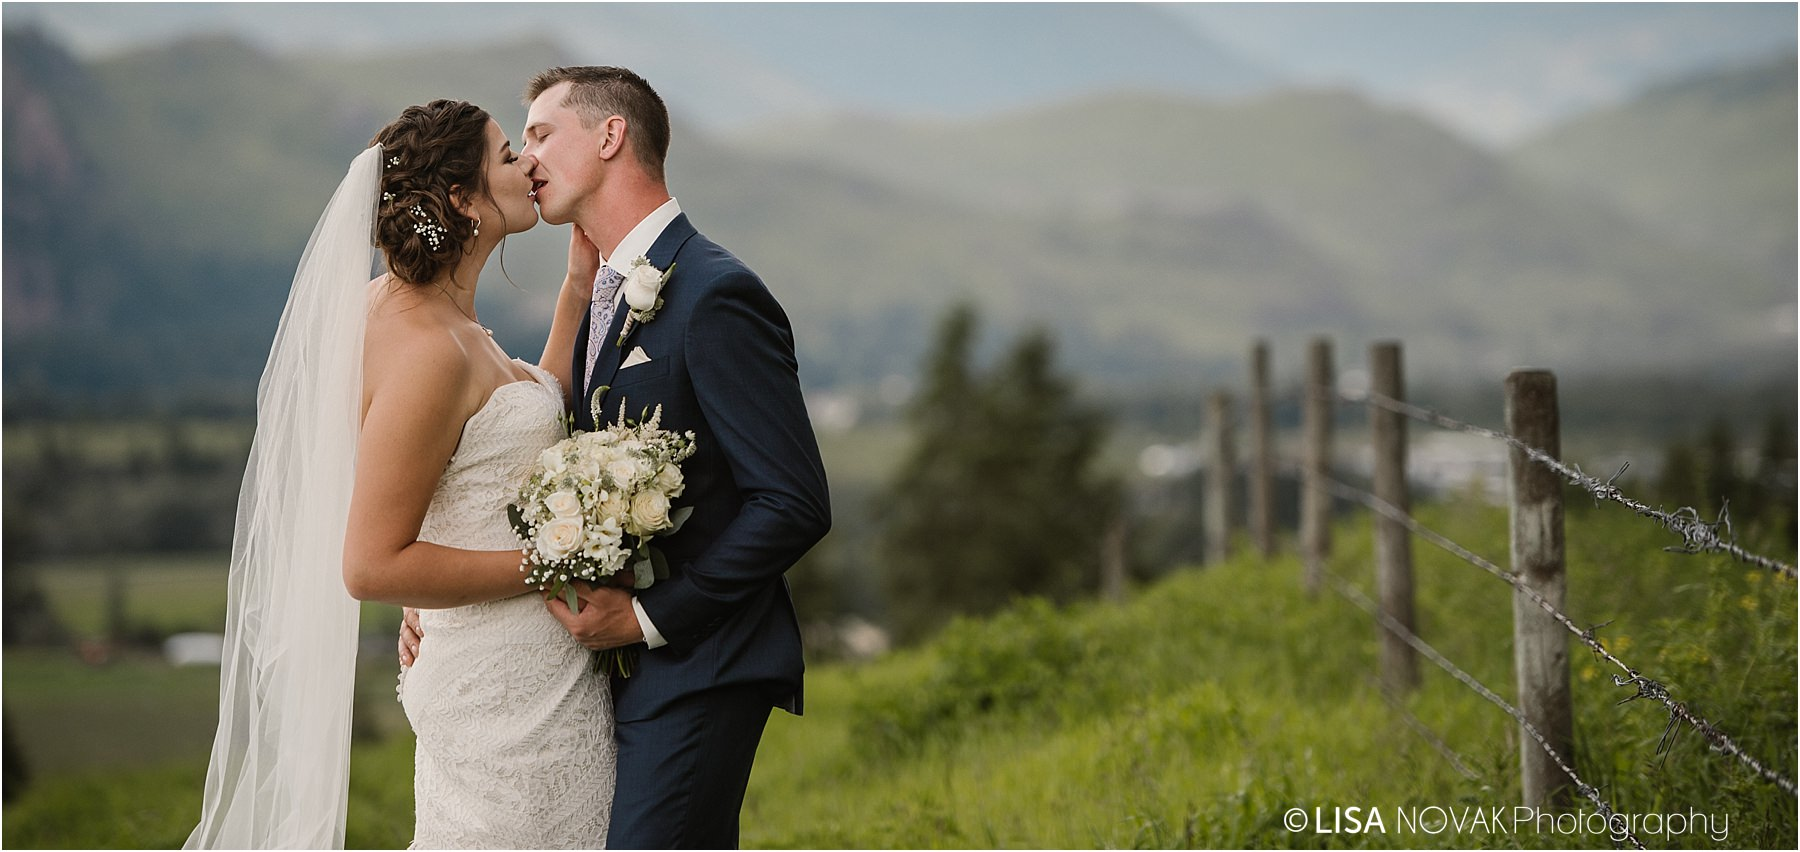 Okanagan wedding photographer beautiful views mountains valley bride groom romantic bridal portraits